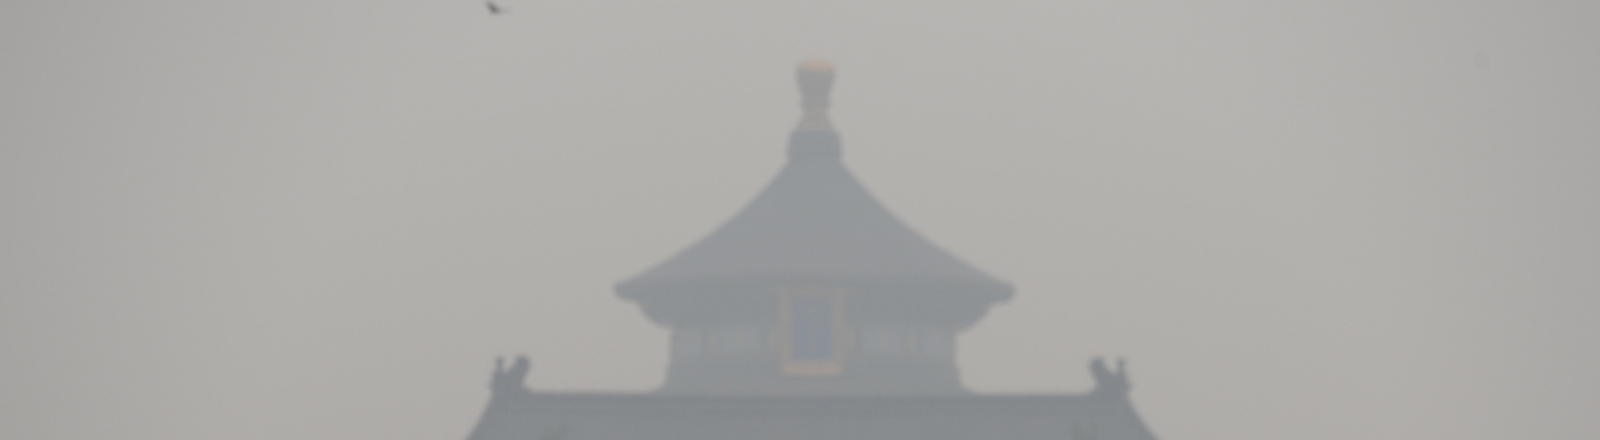 Der Himmelspalast in Peking versinkt im Smog.